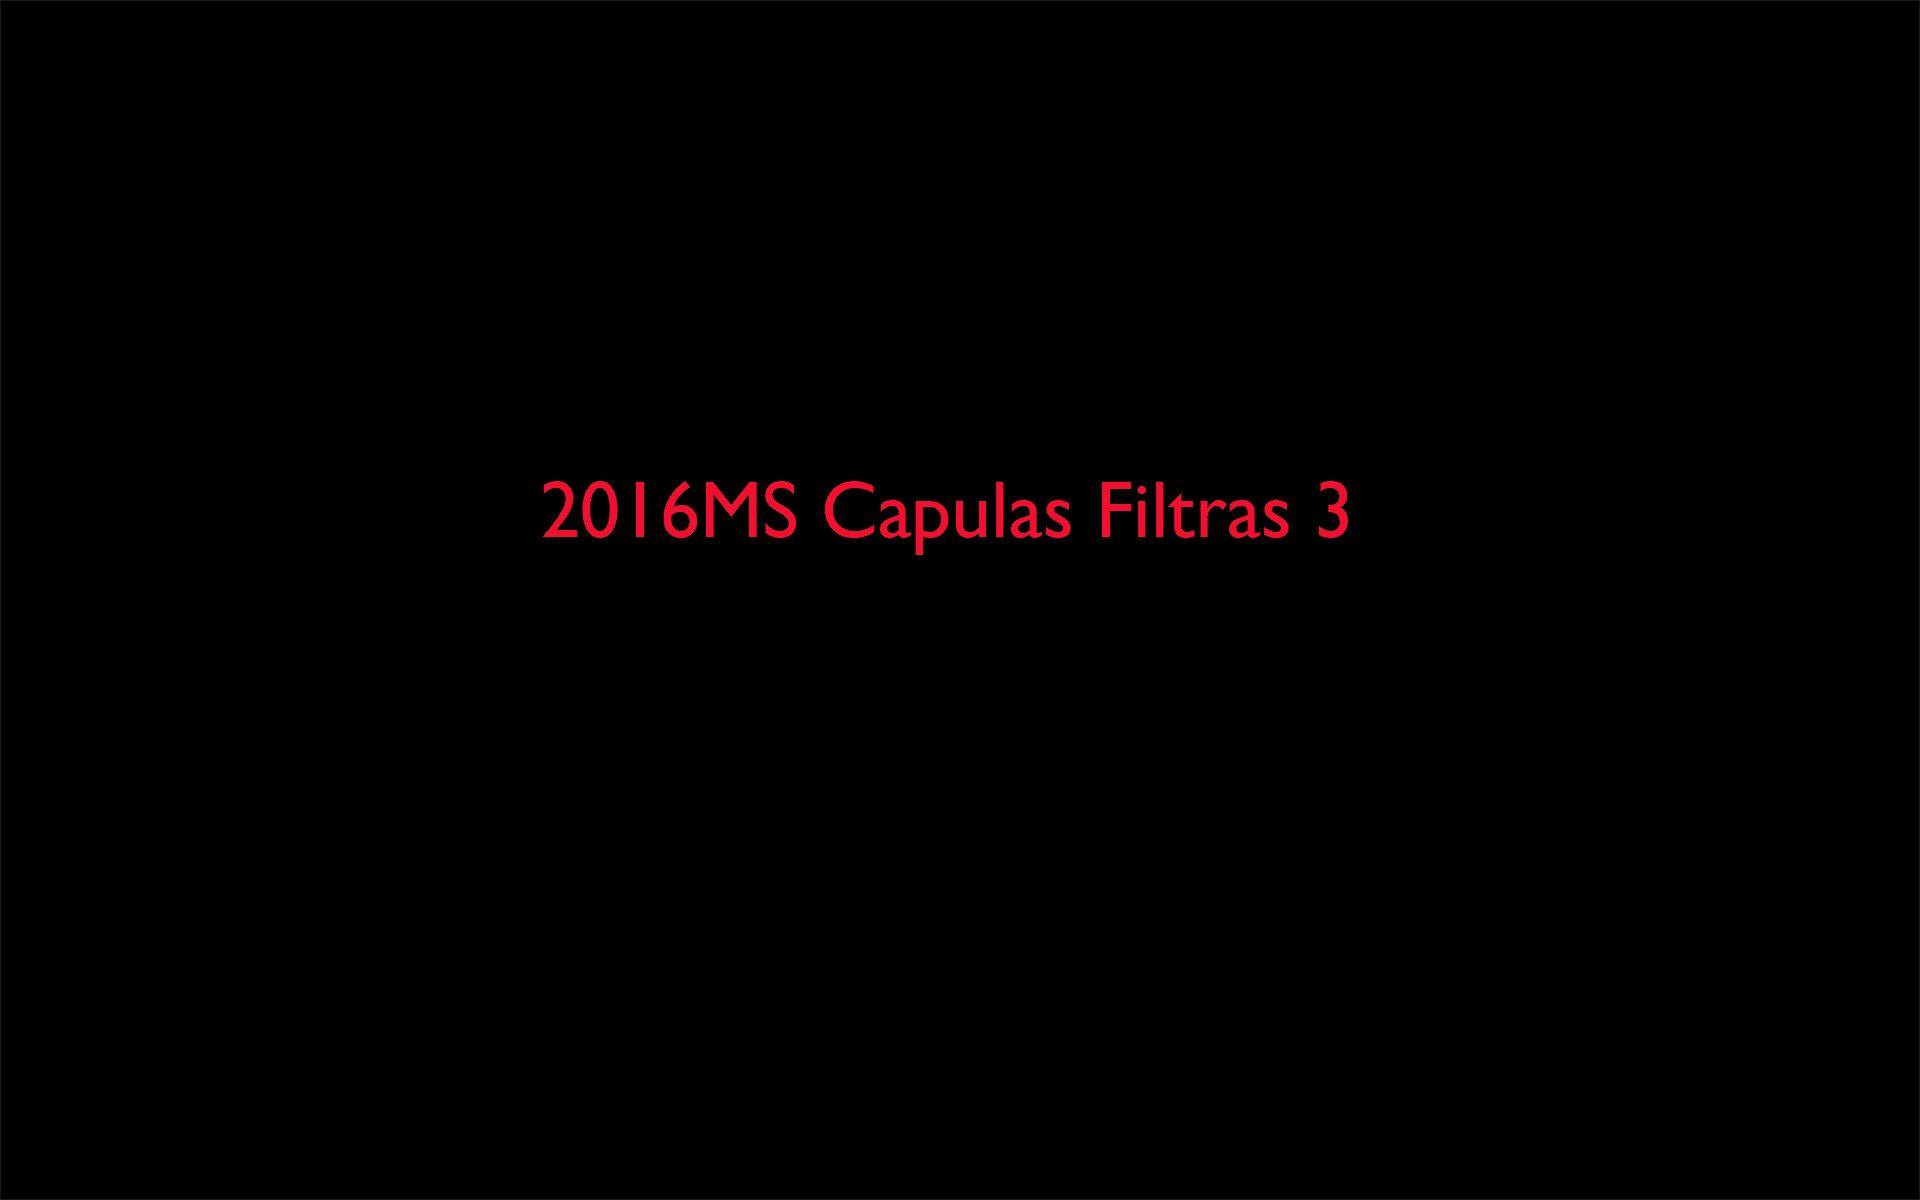 2016MS Capulas Filtras 3.jpg